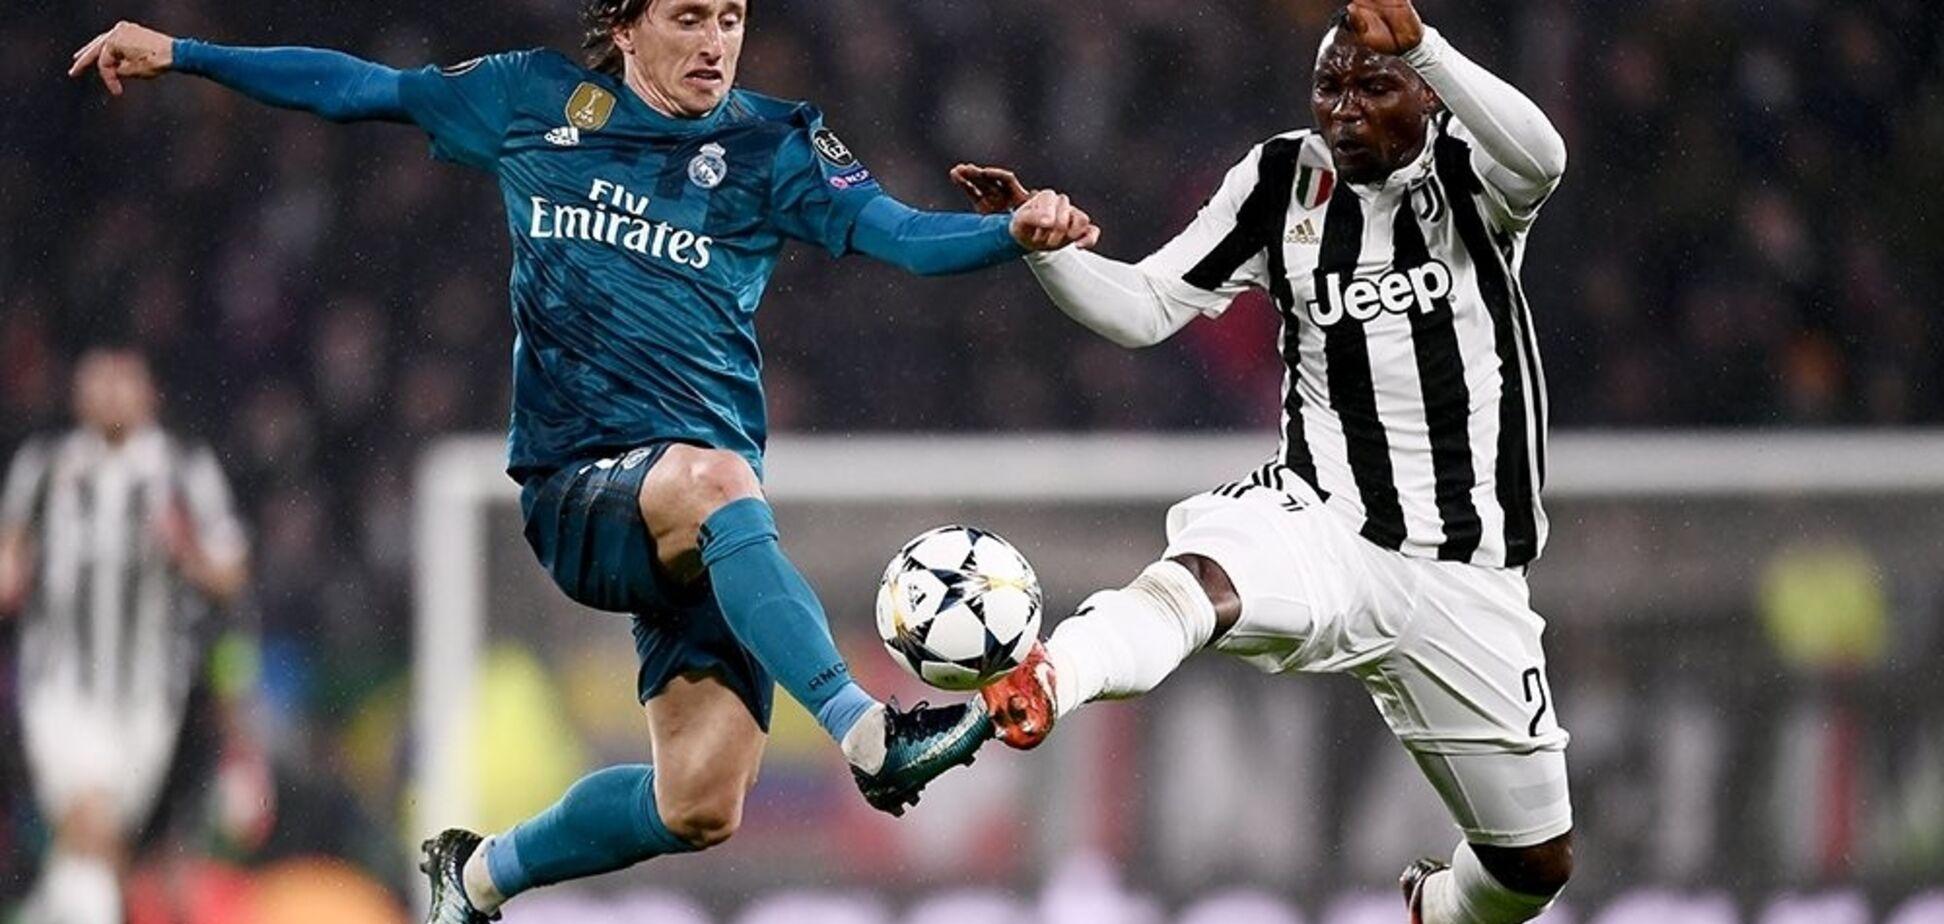 'Реал' - 'Ювентус' - 1-3: онлайн-трансляция 1/4 финала Лиги чемпионов